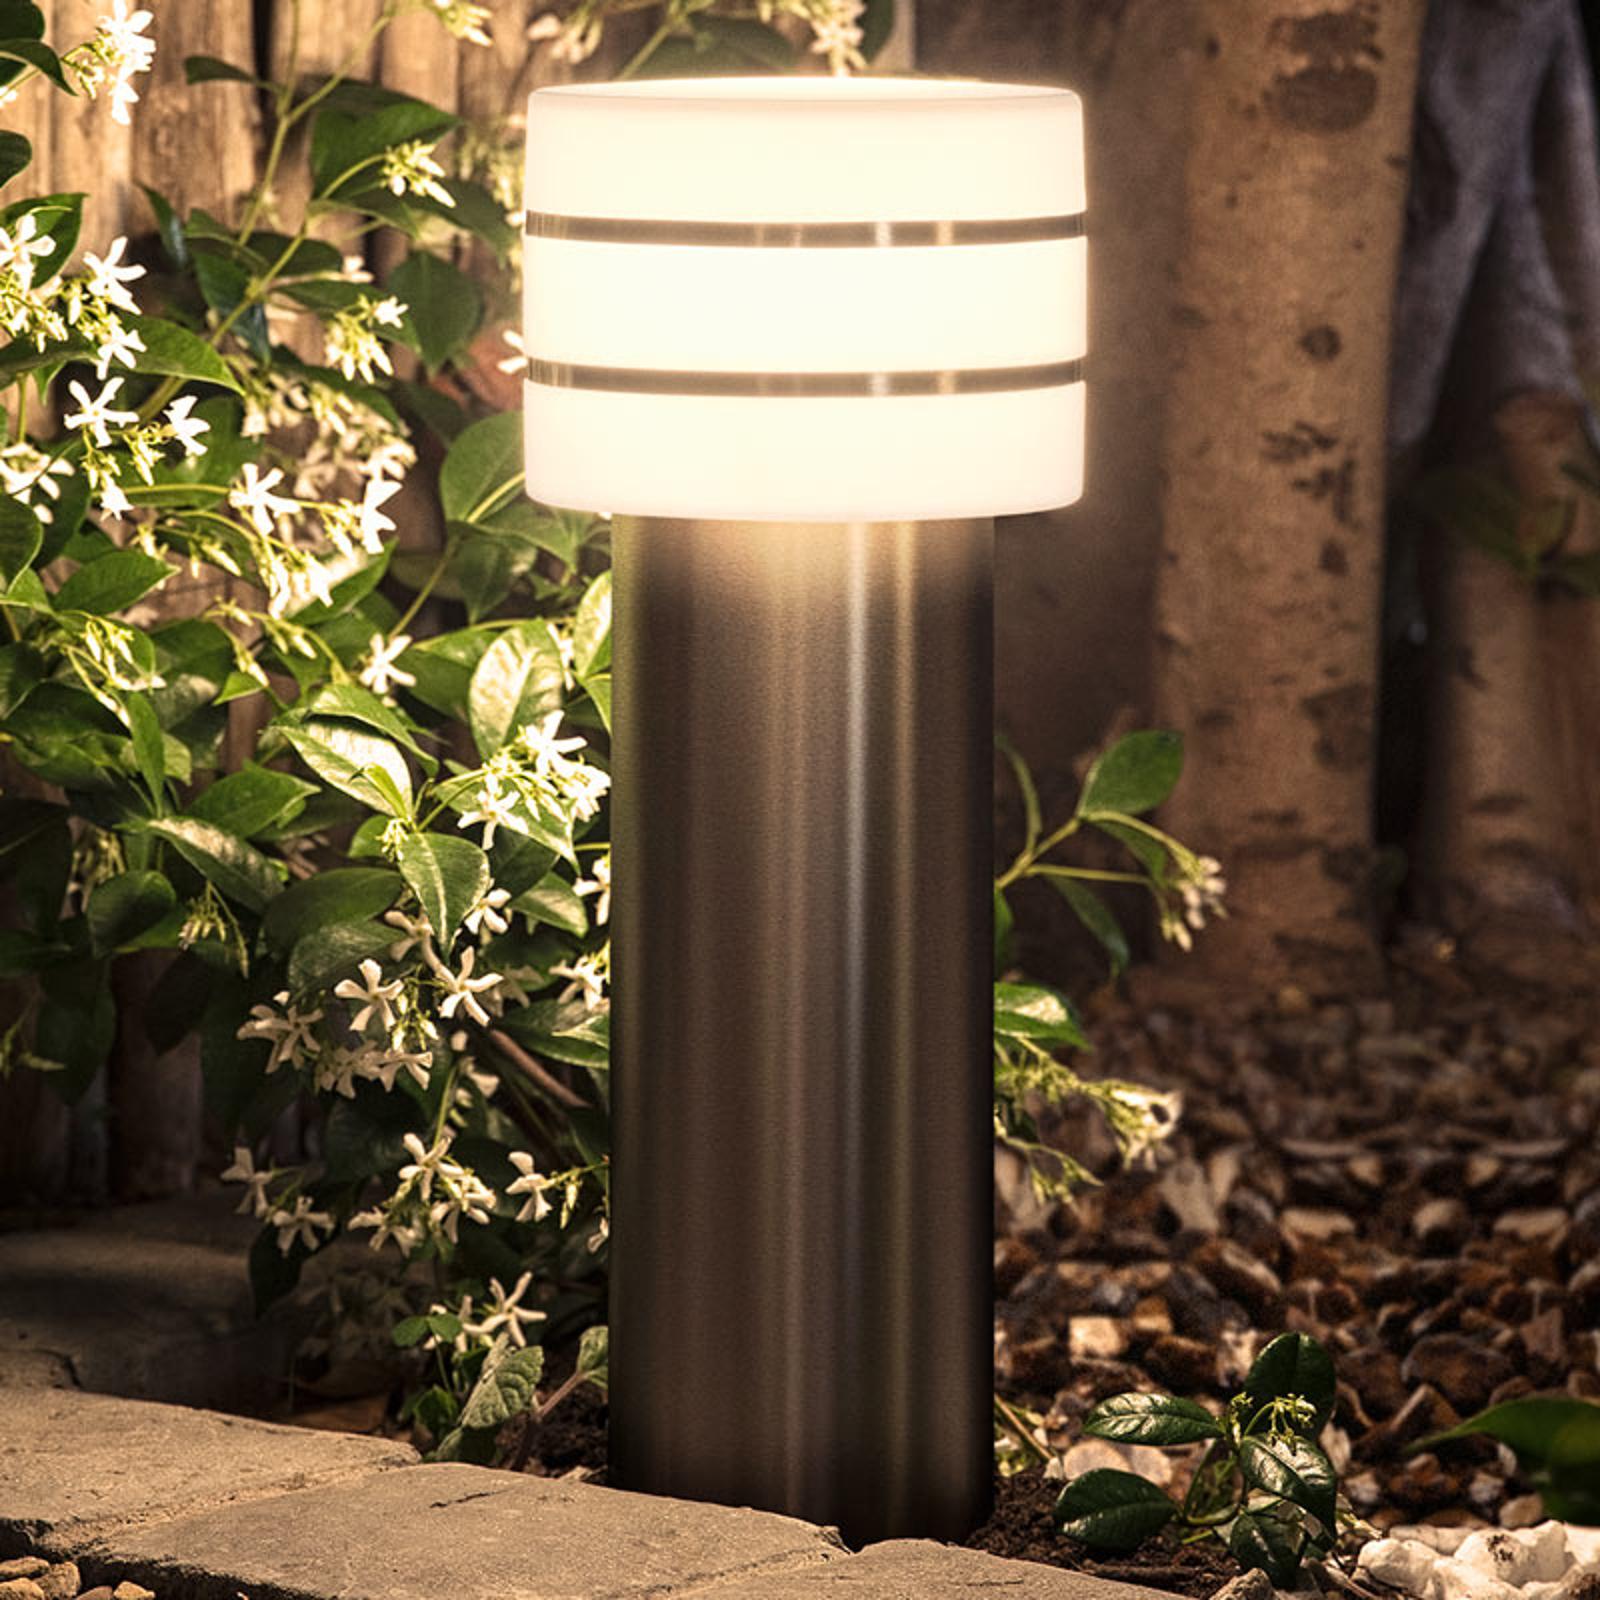 Philips Hue-LED-sokkellampe Tuar, dimbar med app